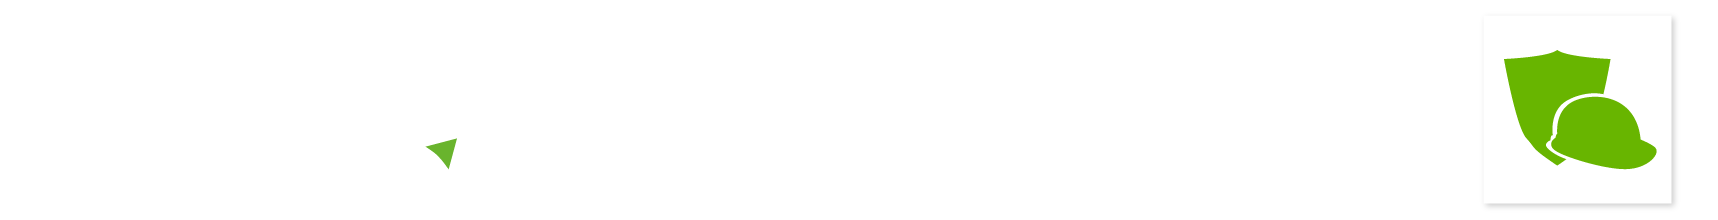 ISO 45001 & Arbeitsschutzmanagement